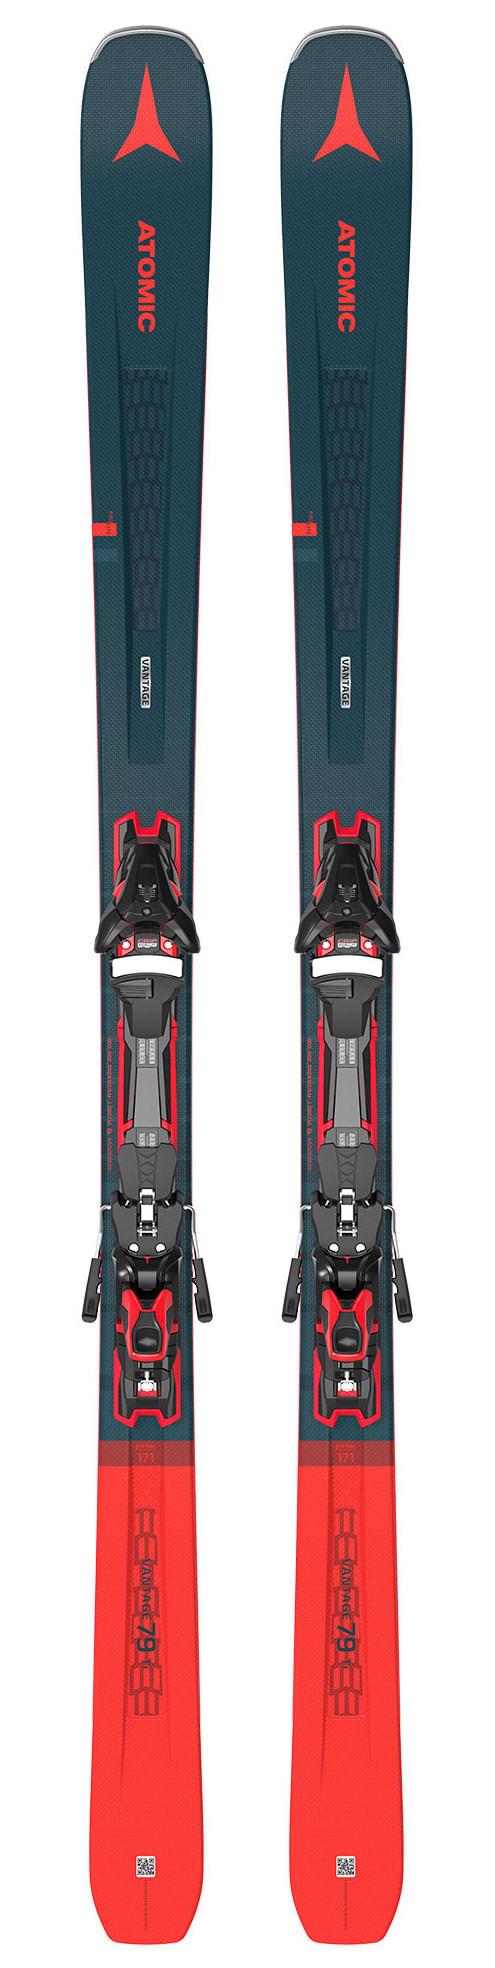 Atomic-Vantage-79-TI-Ski-With-G-12-Grip-Walk-Bindings-2021